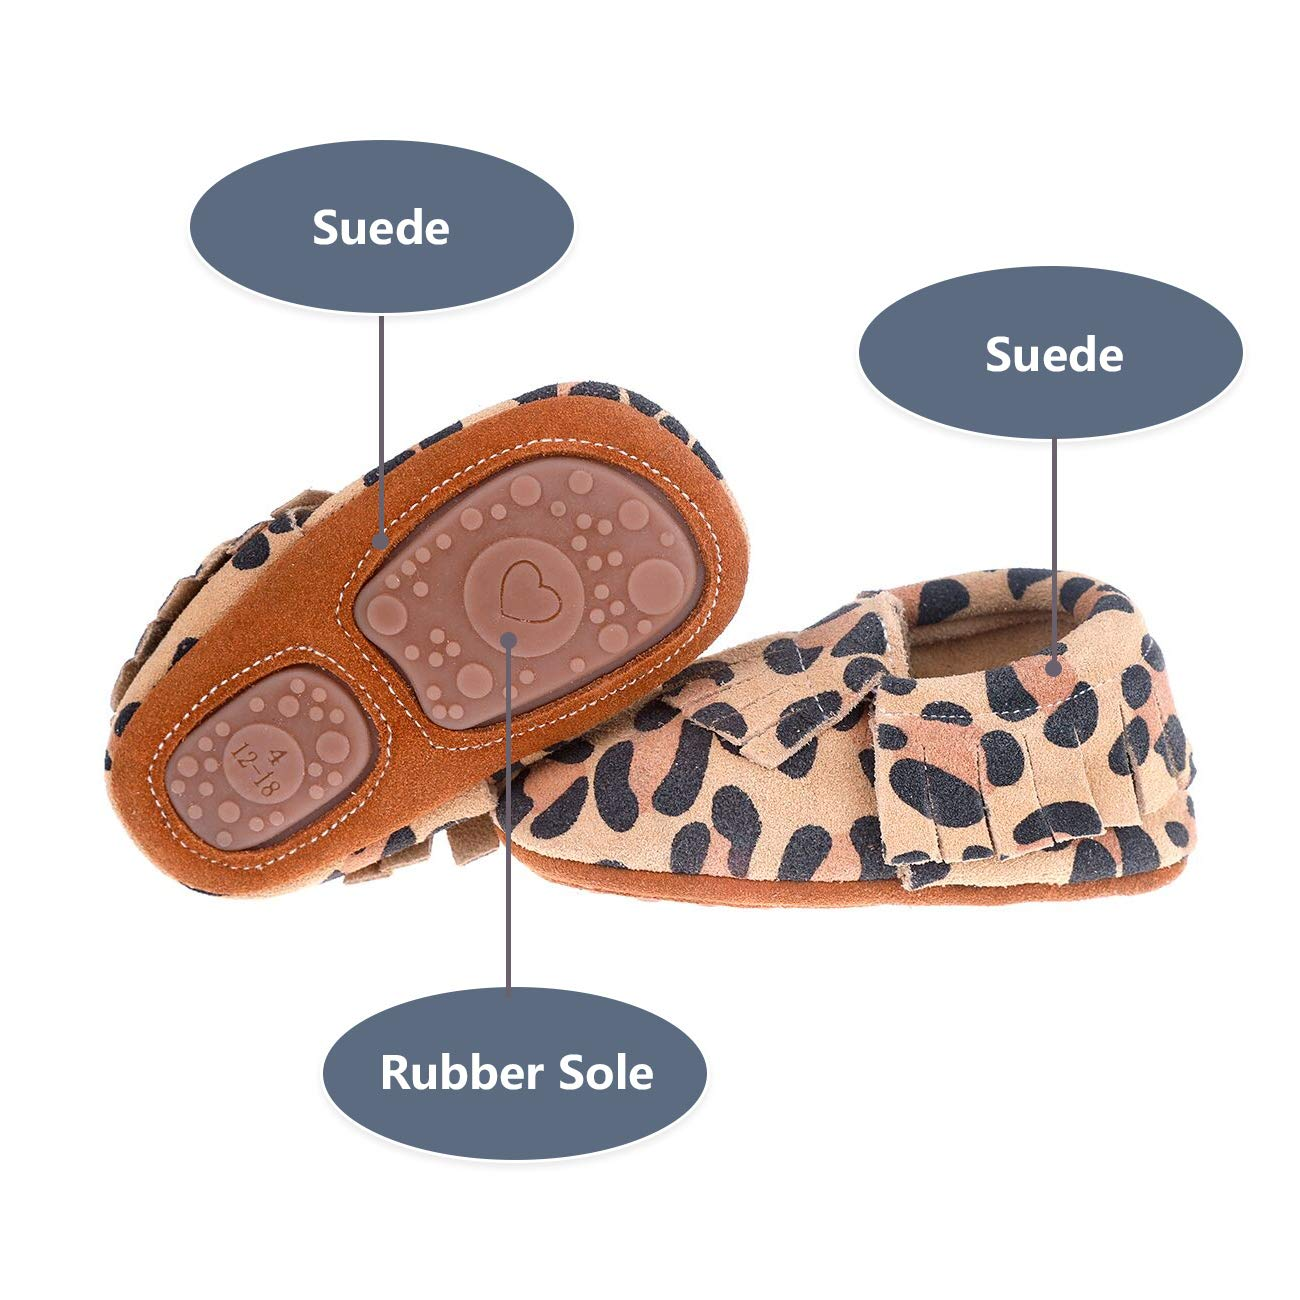 36c87ff1869 Pidoli Baby Leather Shoes Unisex Girls Boys Moccasins Rubber Sole larger  image